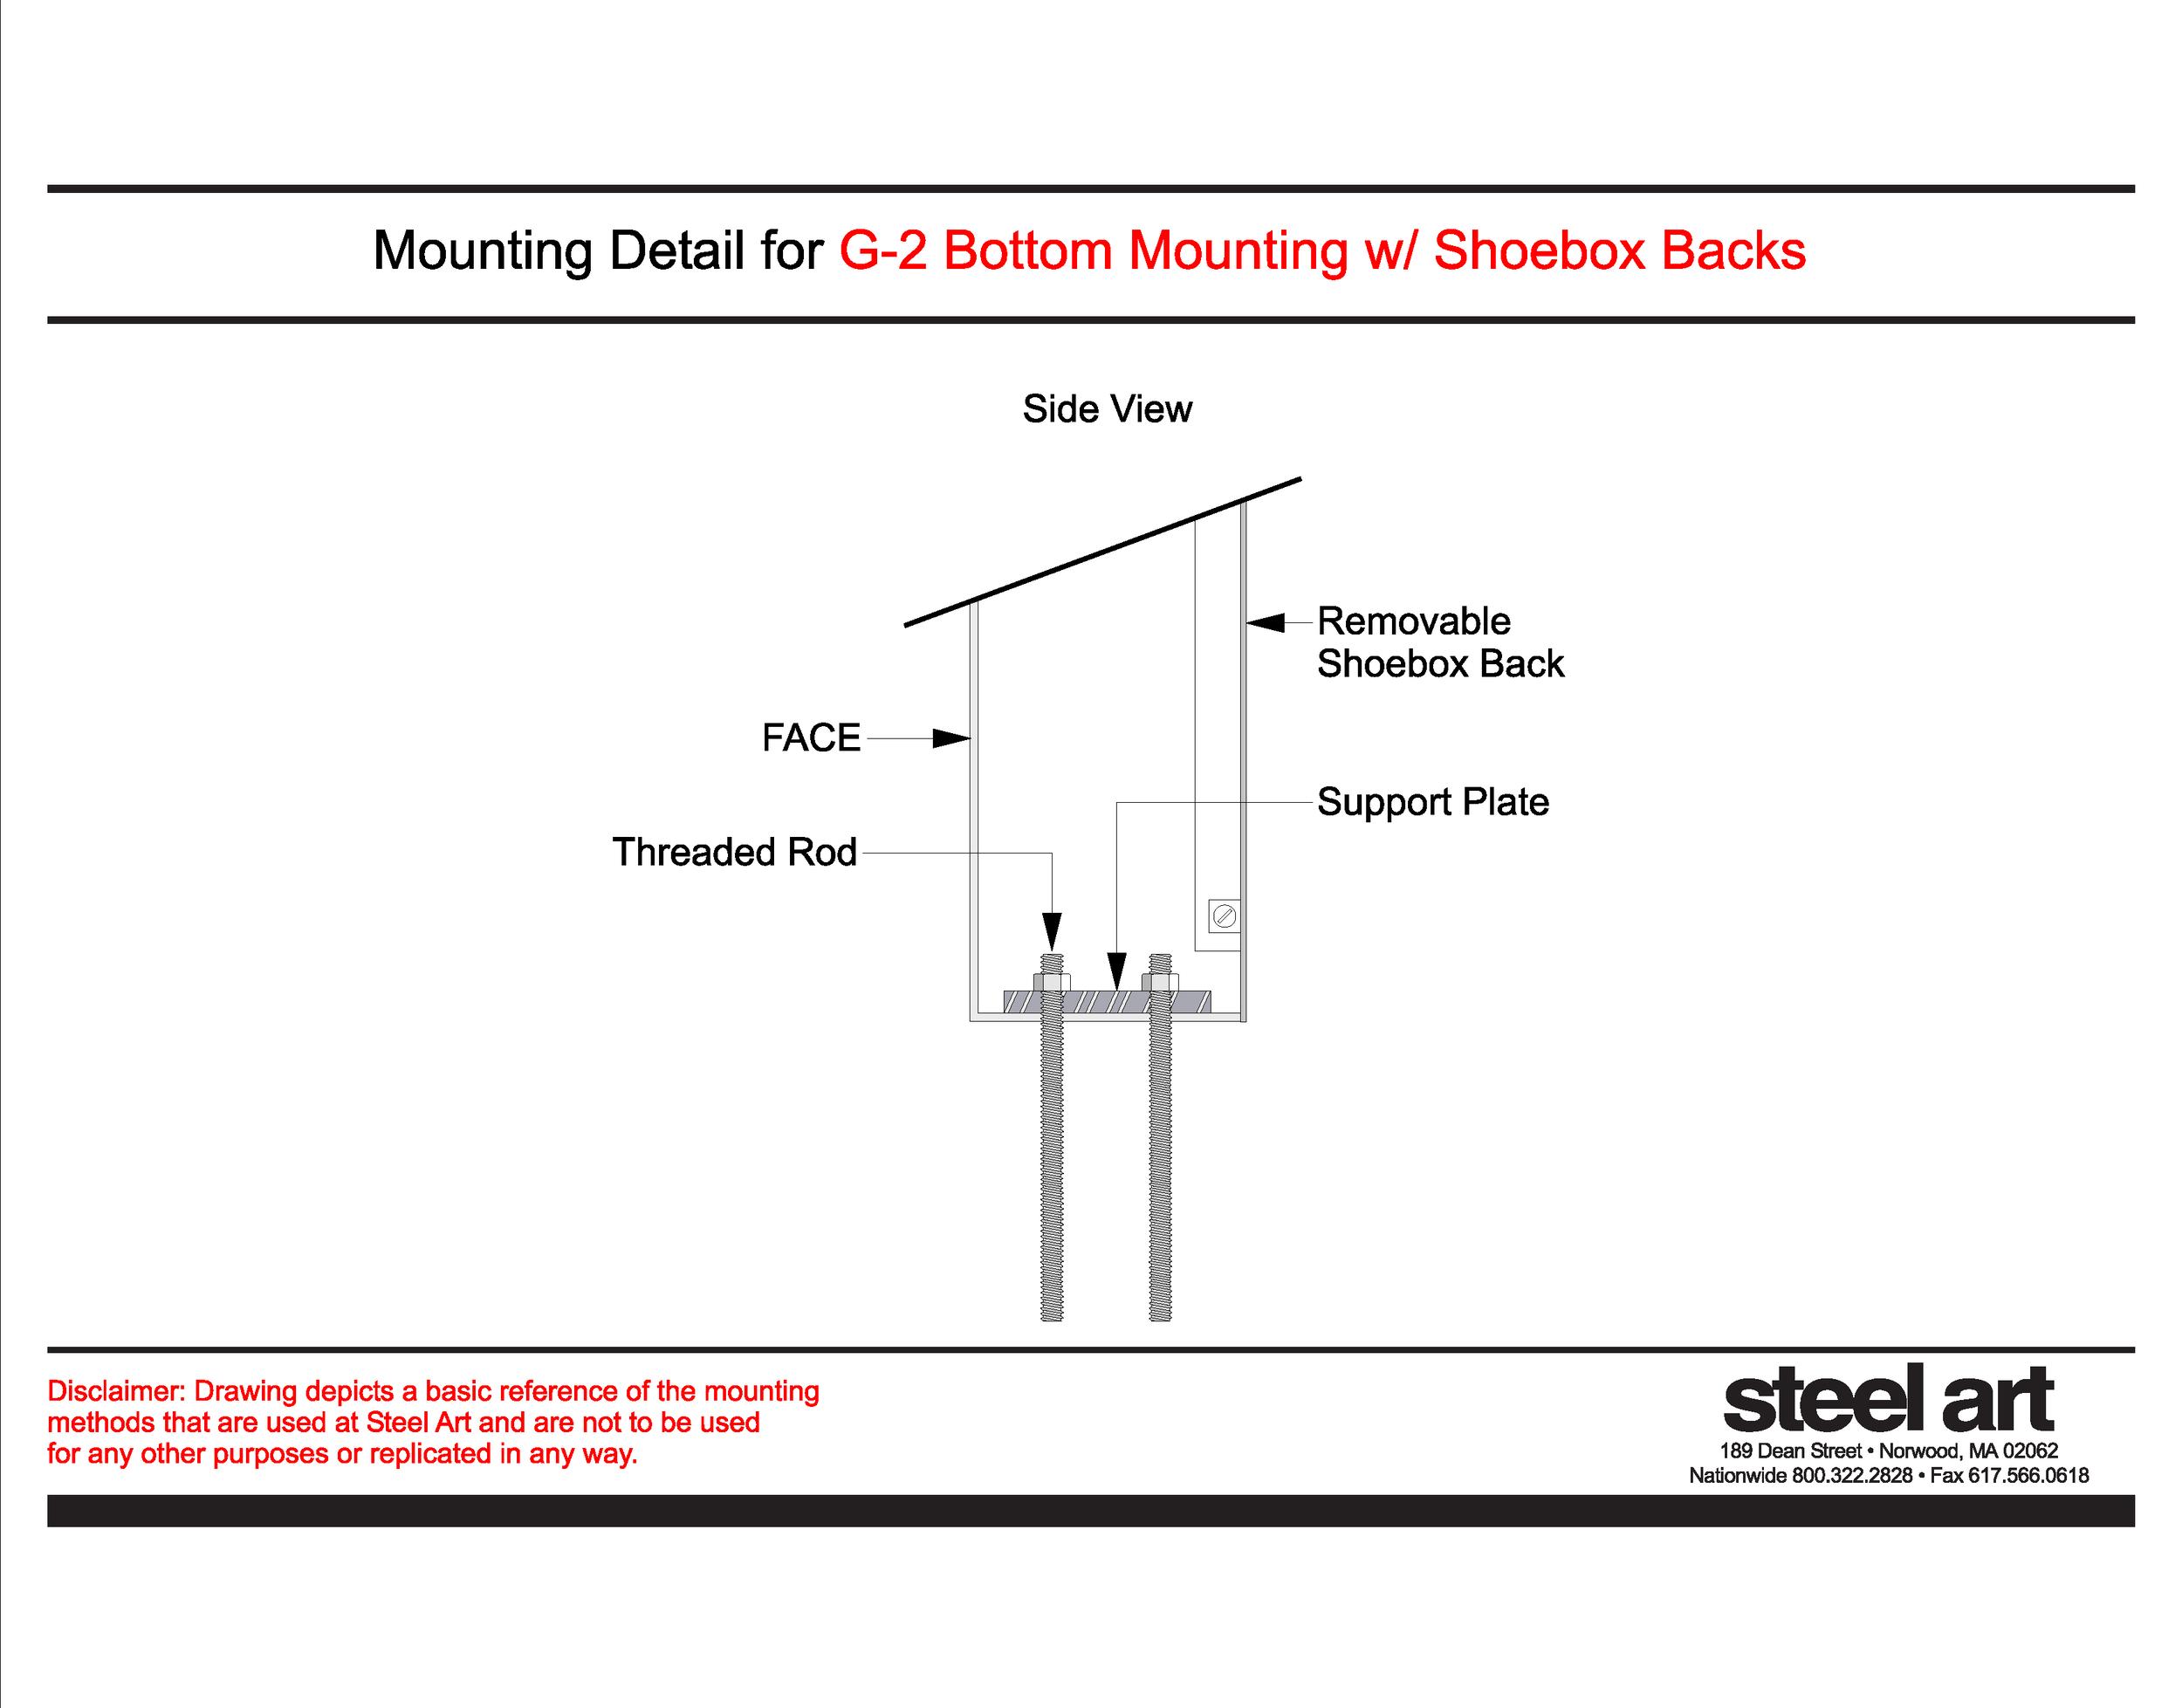 Mounting Detail for G-2 Bottom Mount & Shoebox Backs.png